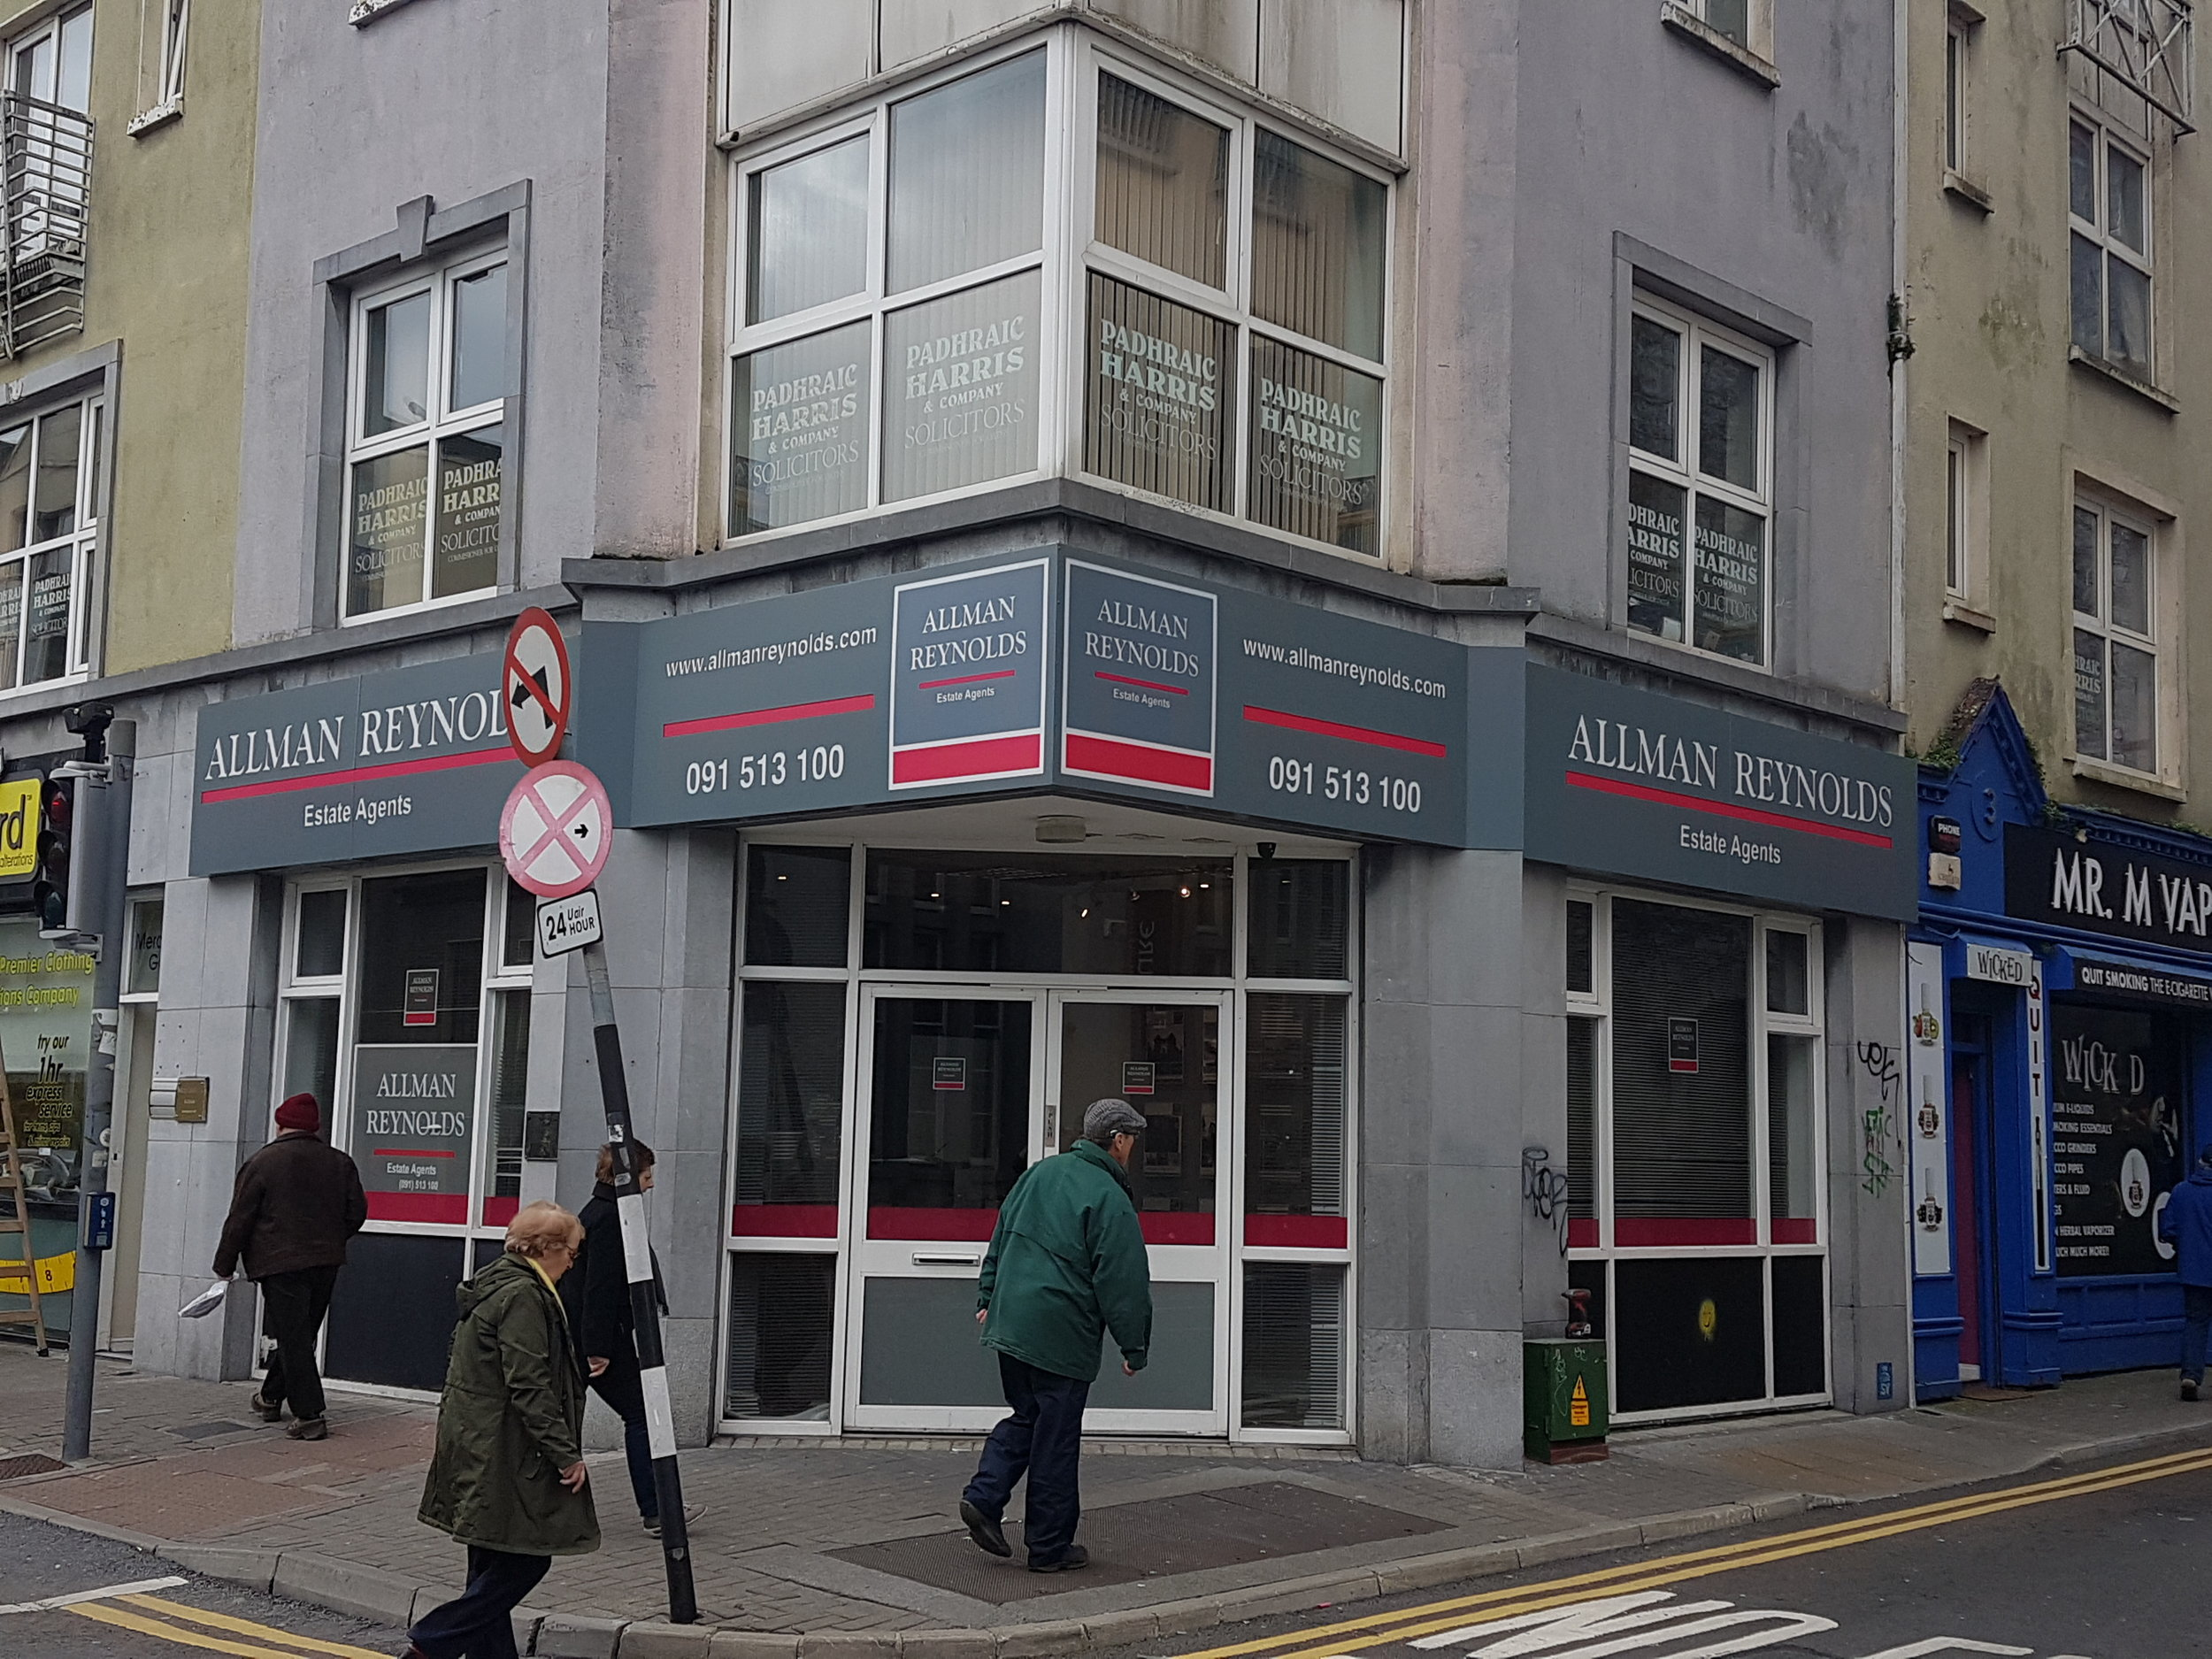 Allman Reynolds, Merchants Rd, Galway